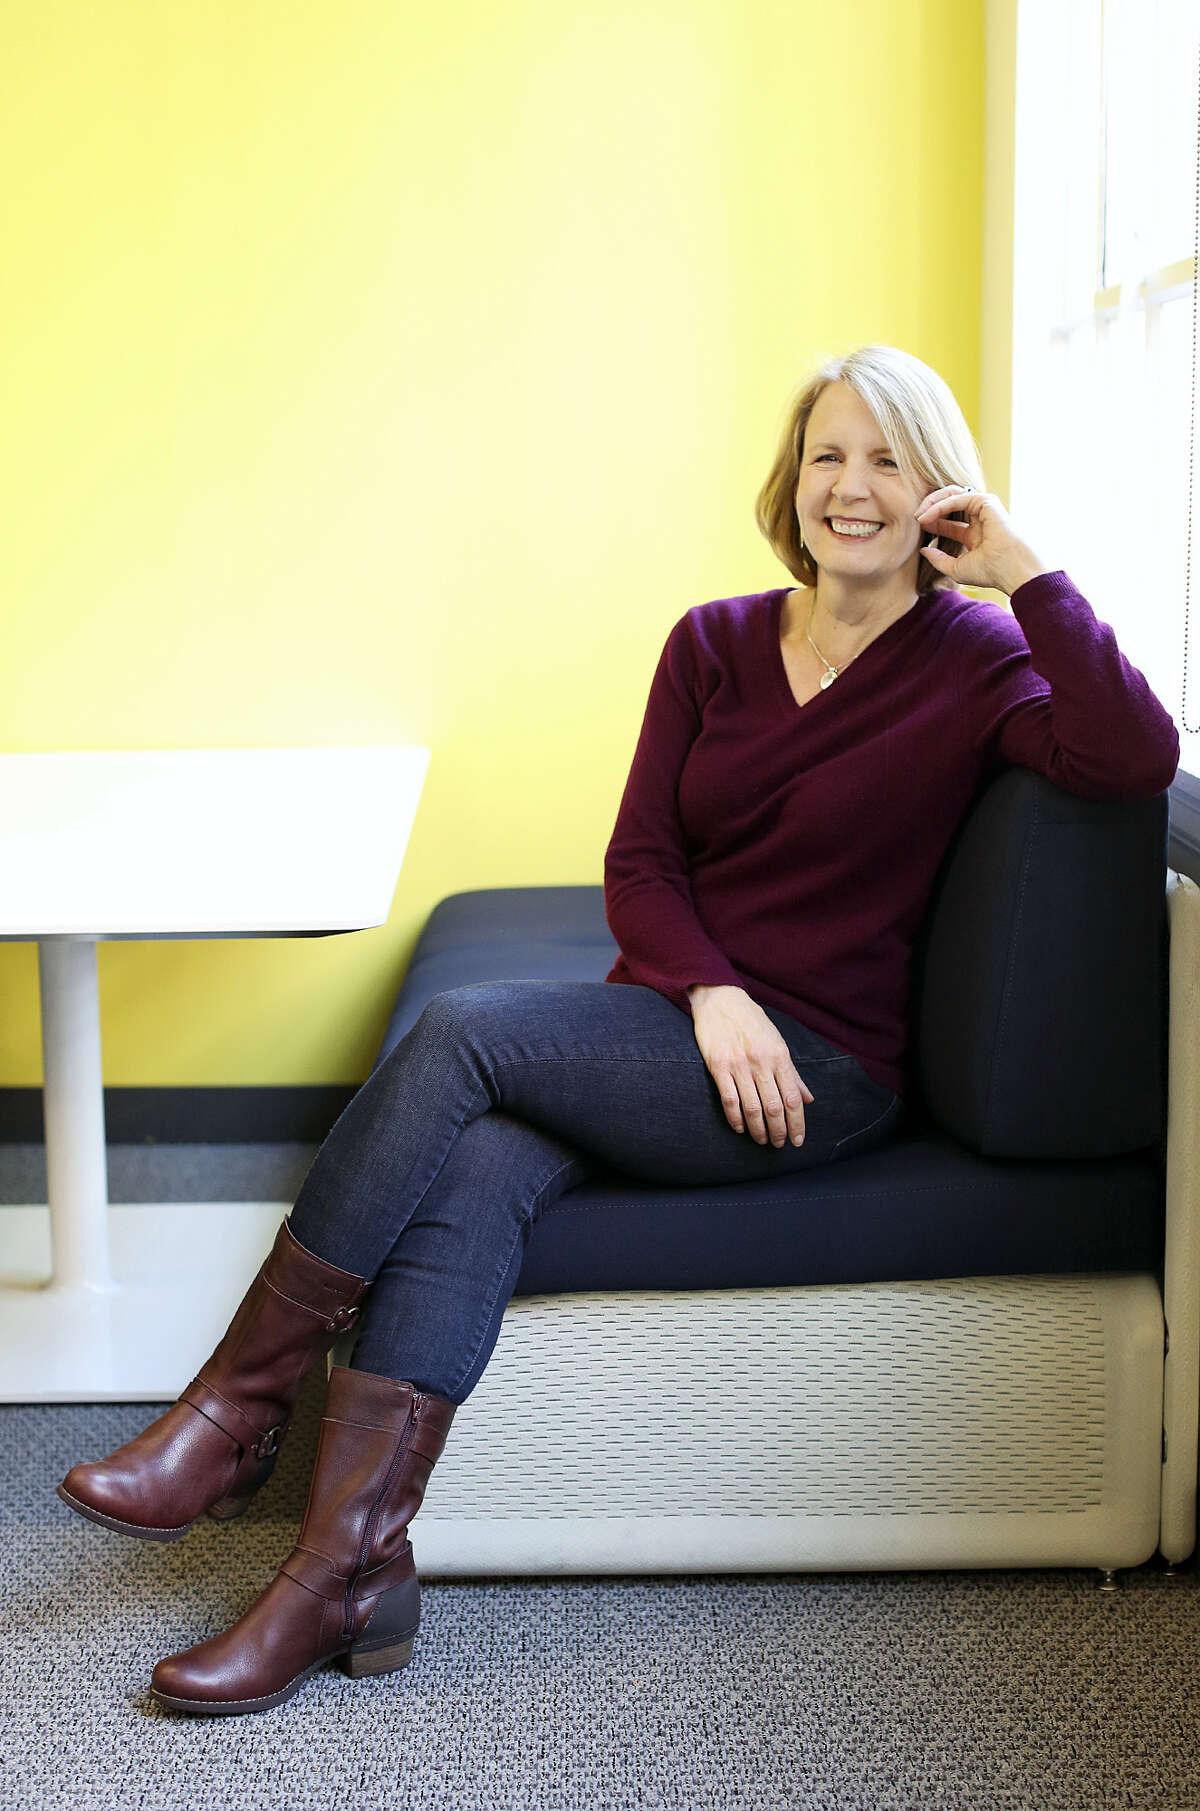 This photo provided by NerdWallet shows Liz Weston, a columnist for personal finance website NerdWallet.com.